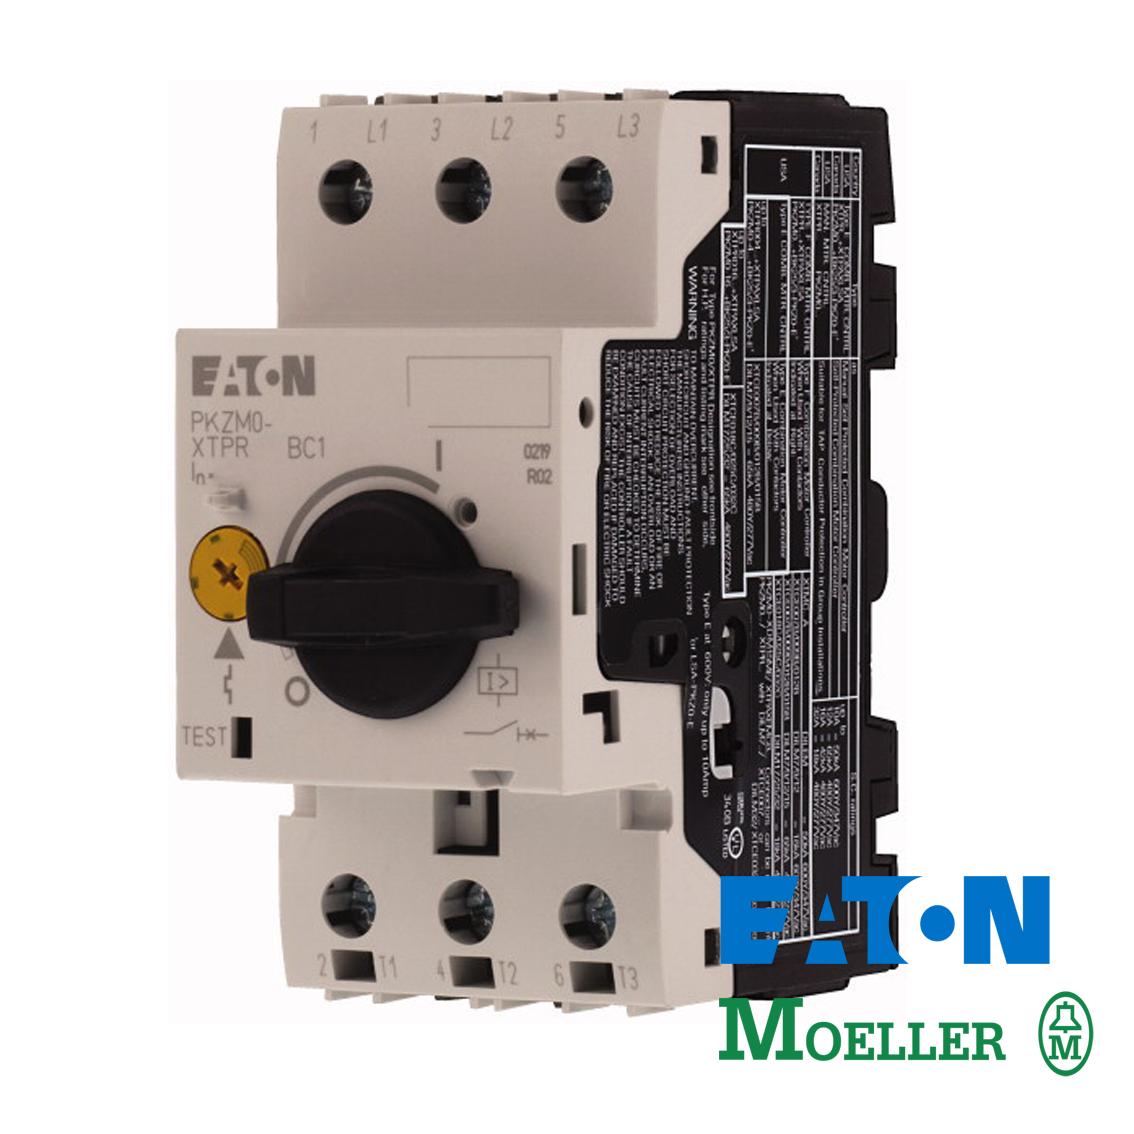 Motorni zaštitni prekidač PKZM0-32 Eaton-Moeller Elektro Vukojevic